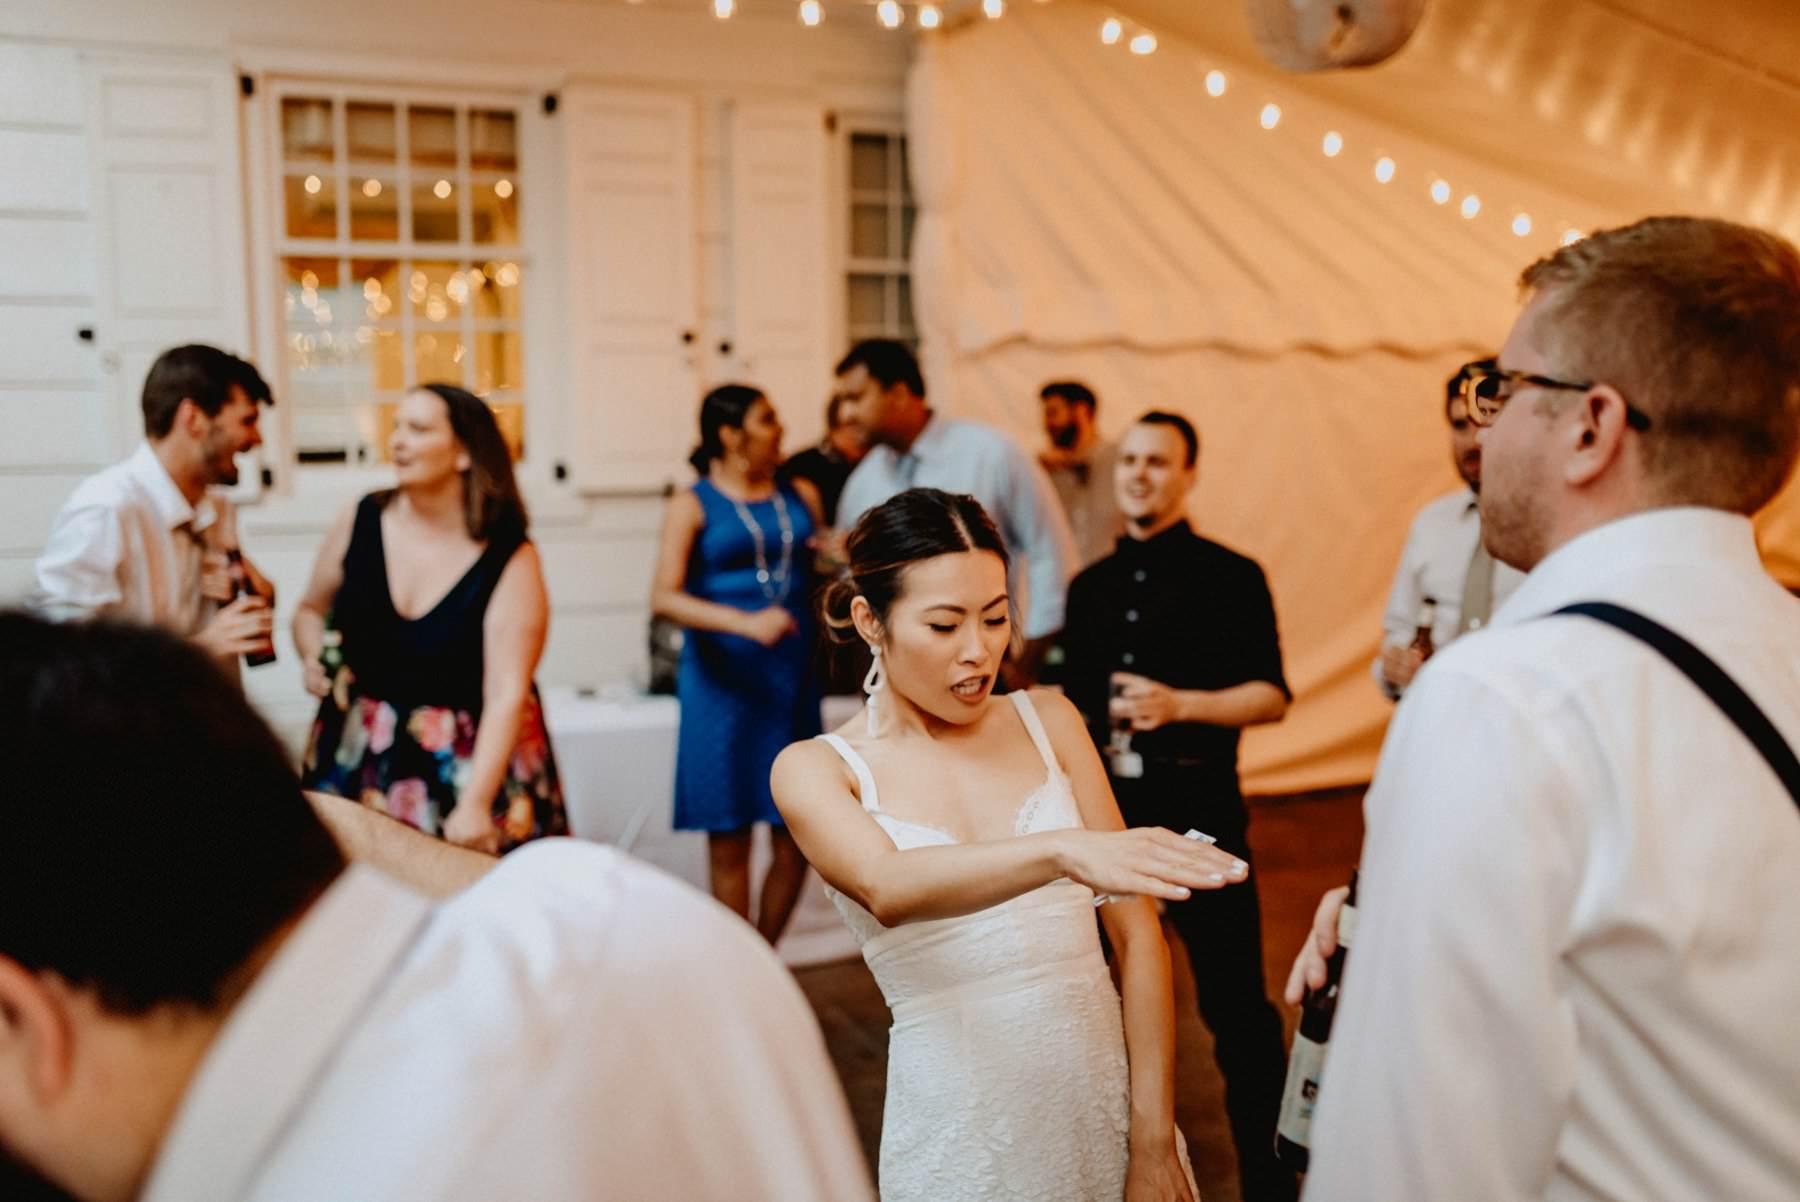 Appleford-estate-wedding-142.jpg